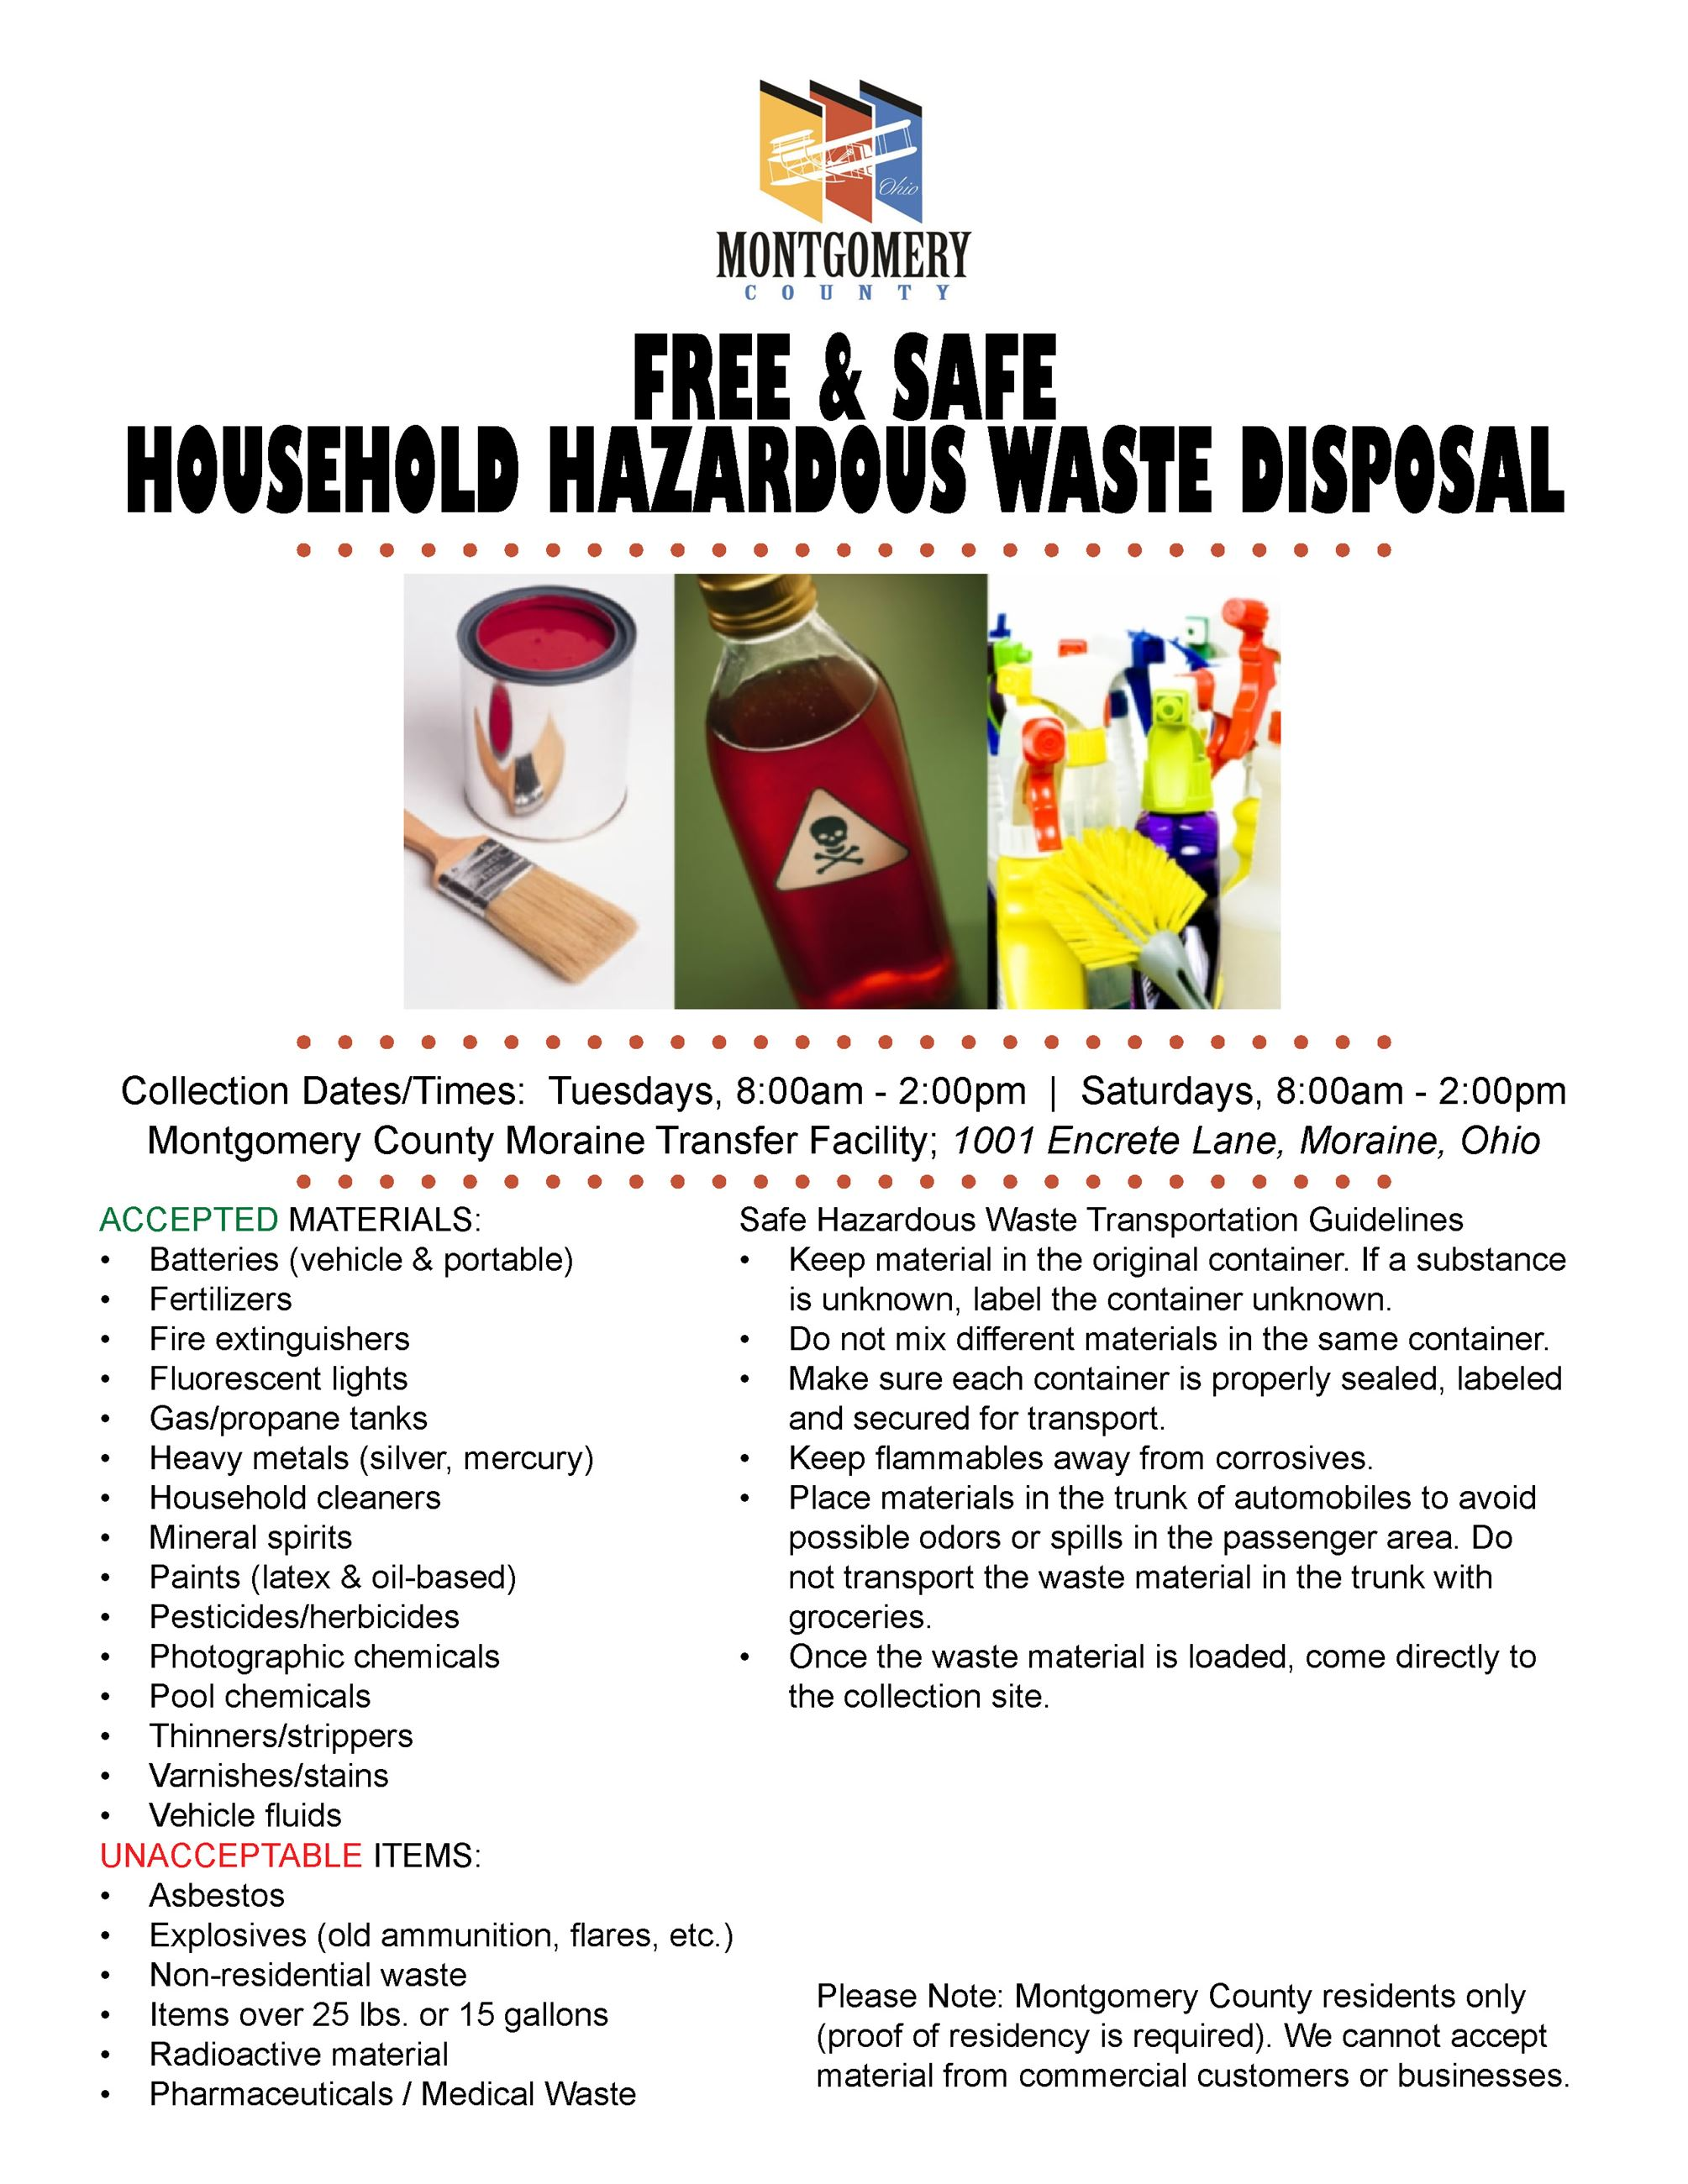 Household Hazardous Waste | Clayton, OH - Official Website